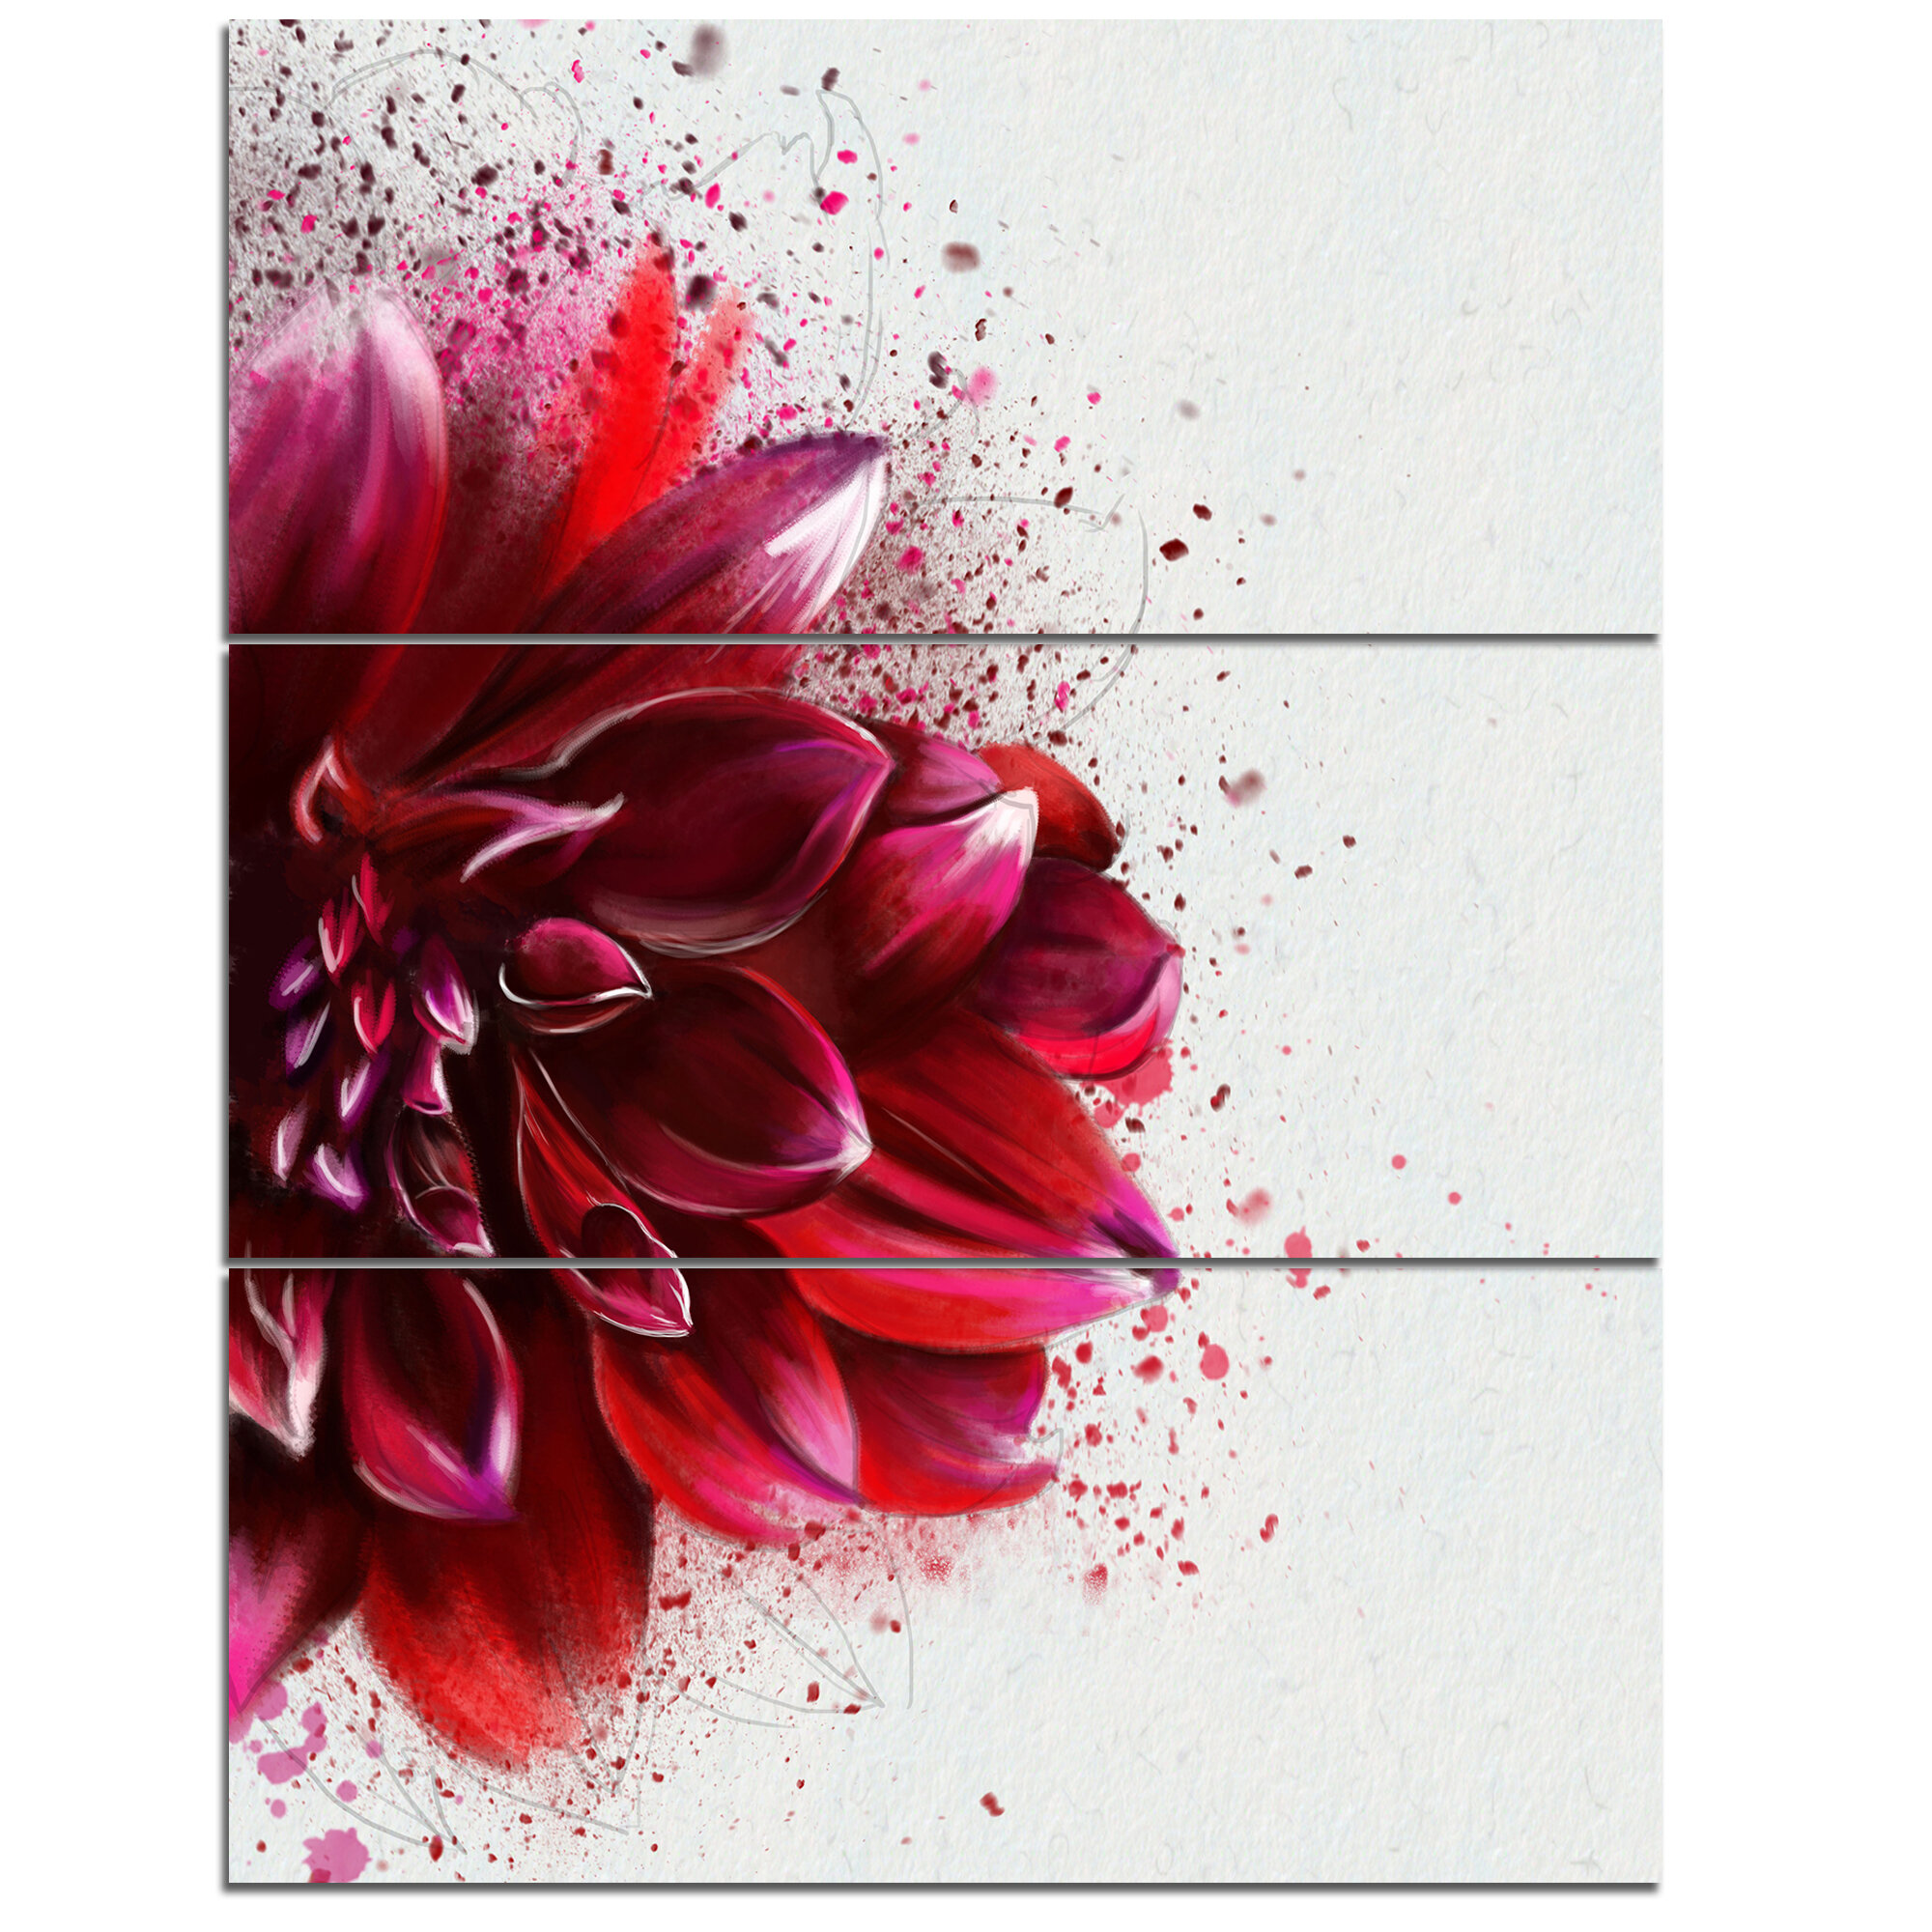 Designart Dark Red Watercolor Rose Flower 3 Piece Graphic Art On Wrapped Canvas Set Wayfair